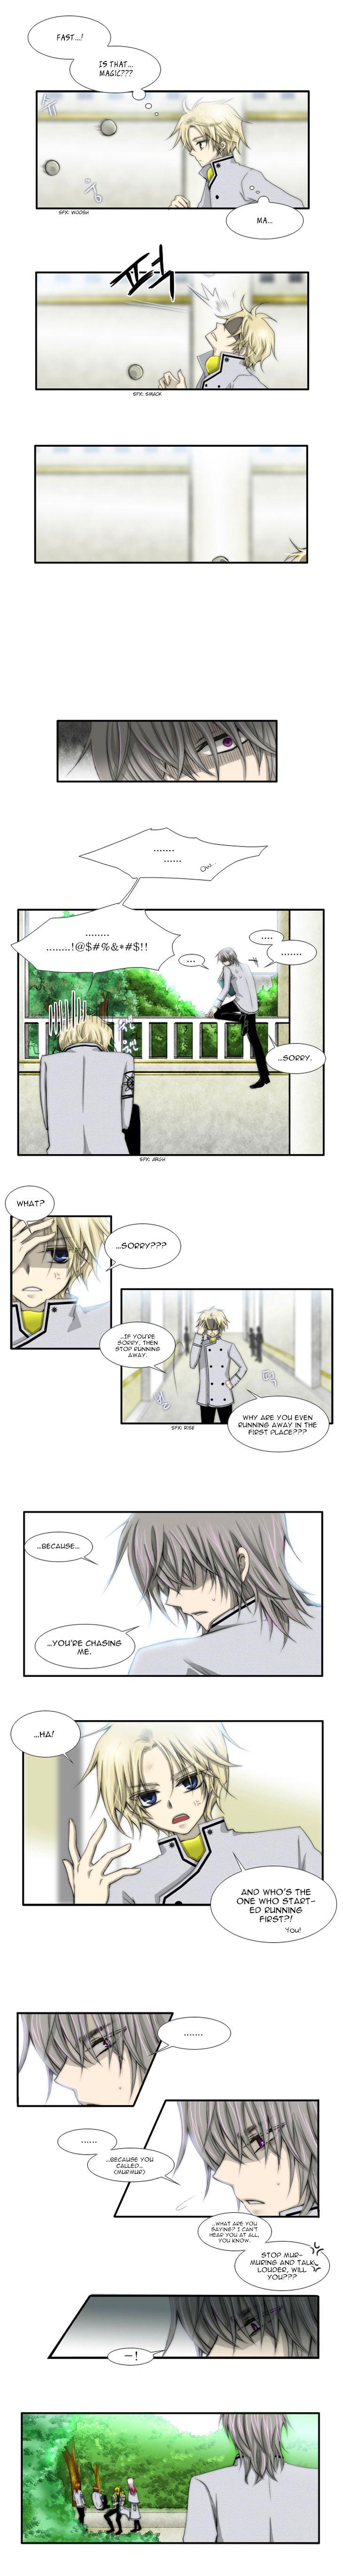 Black Haze 18 Page 2